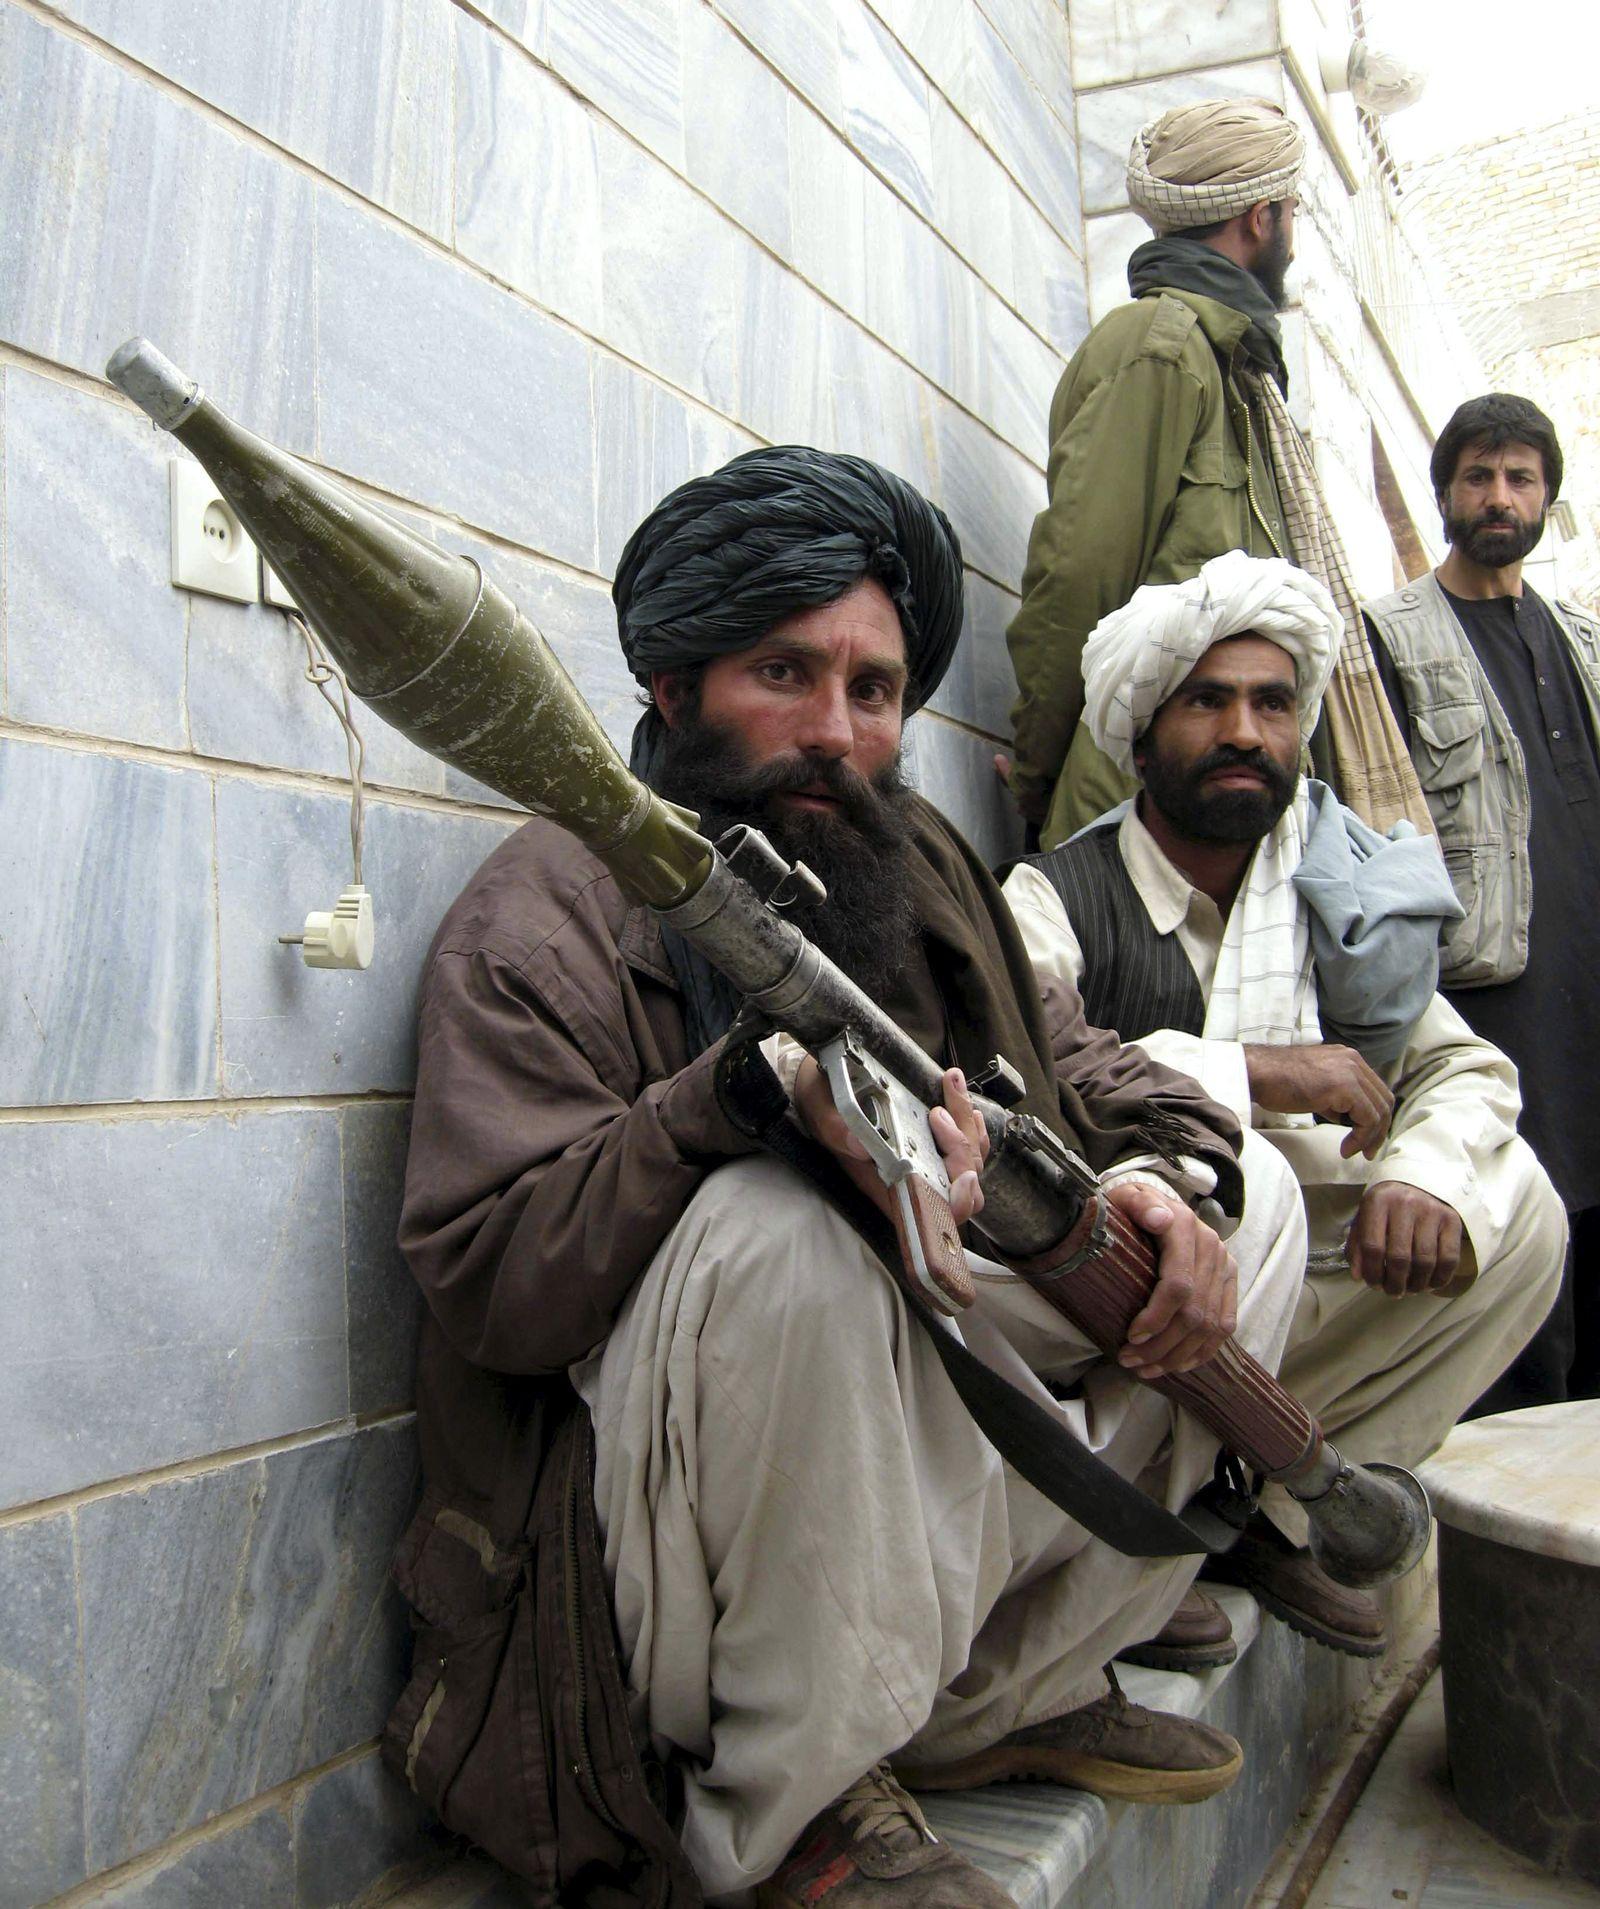 Ehemalige Taliban